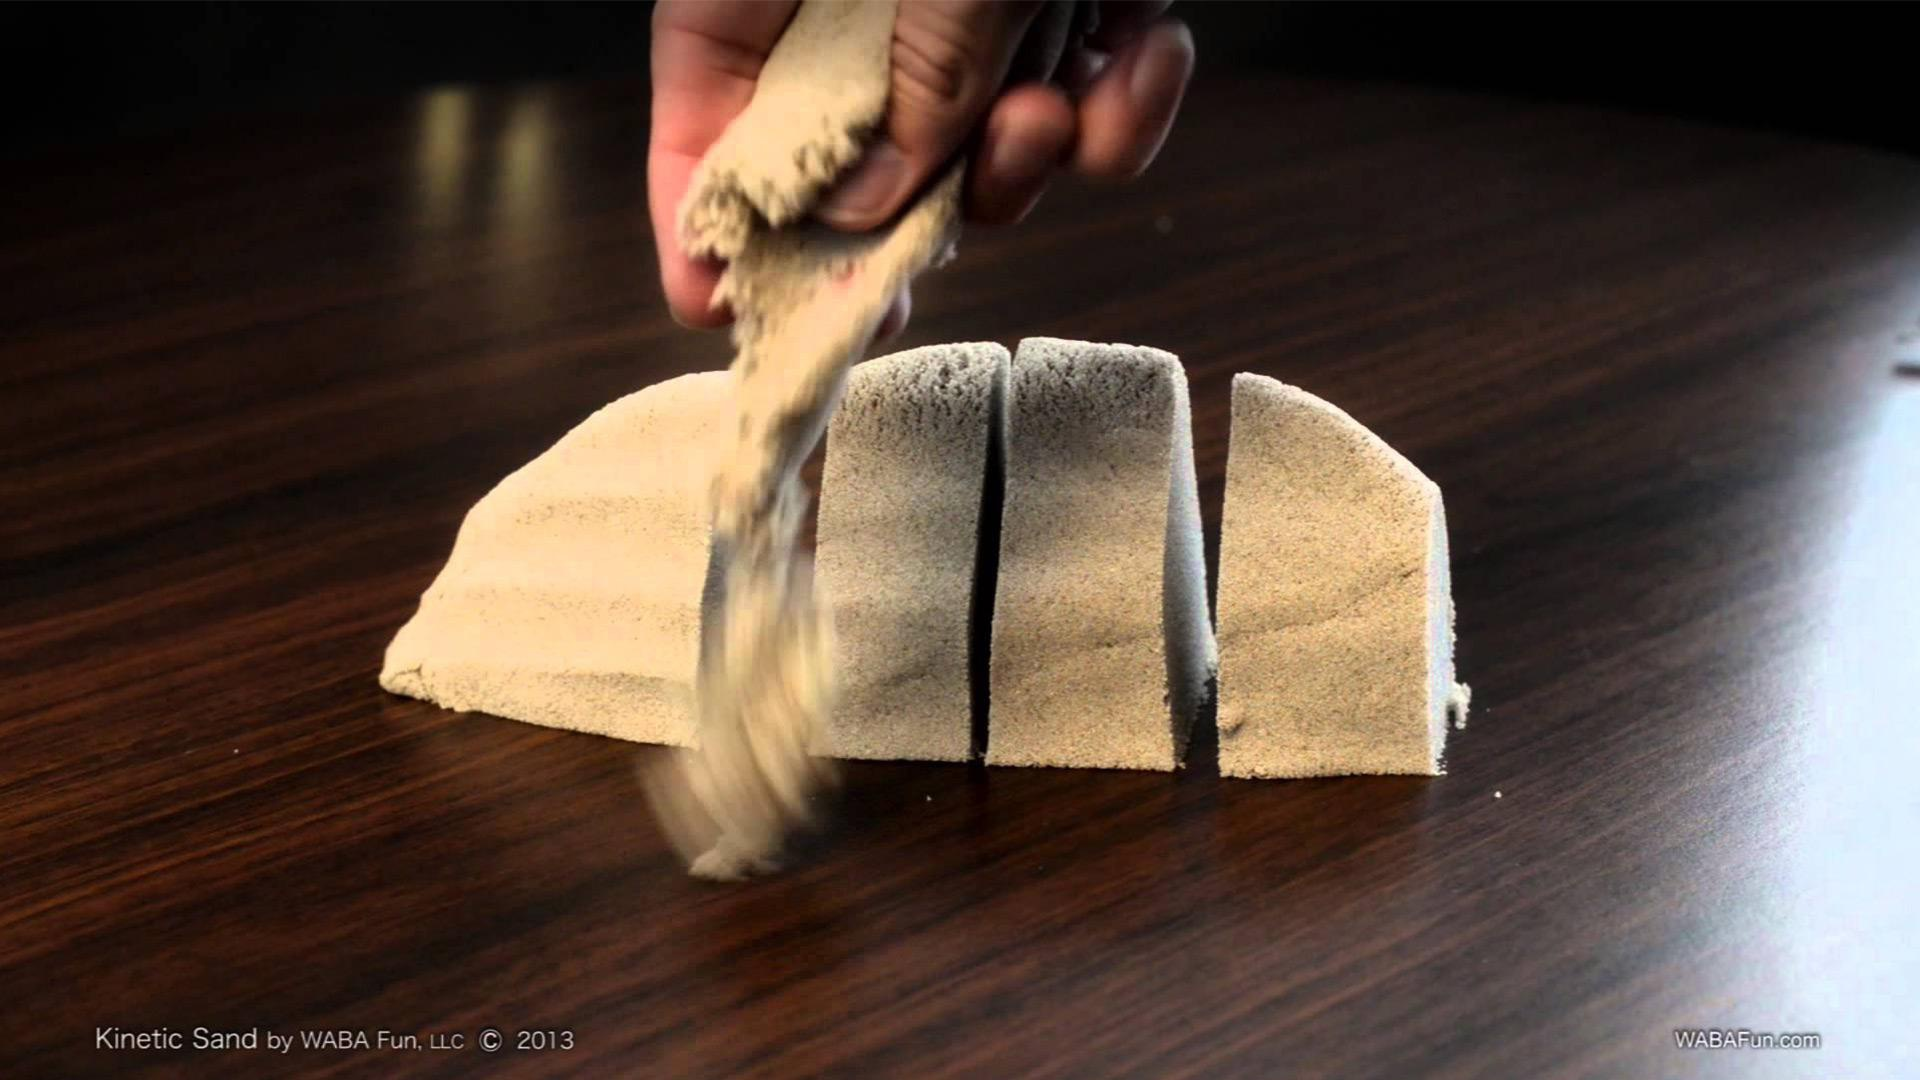 Cool sensory activities with kinetic sand